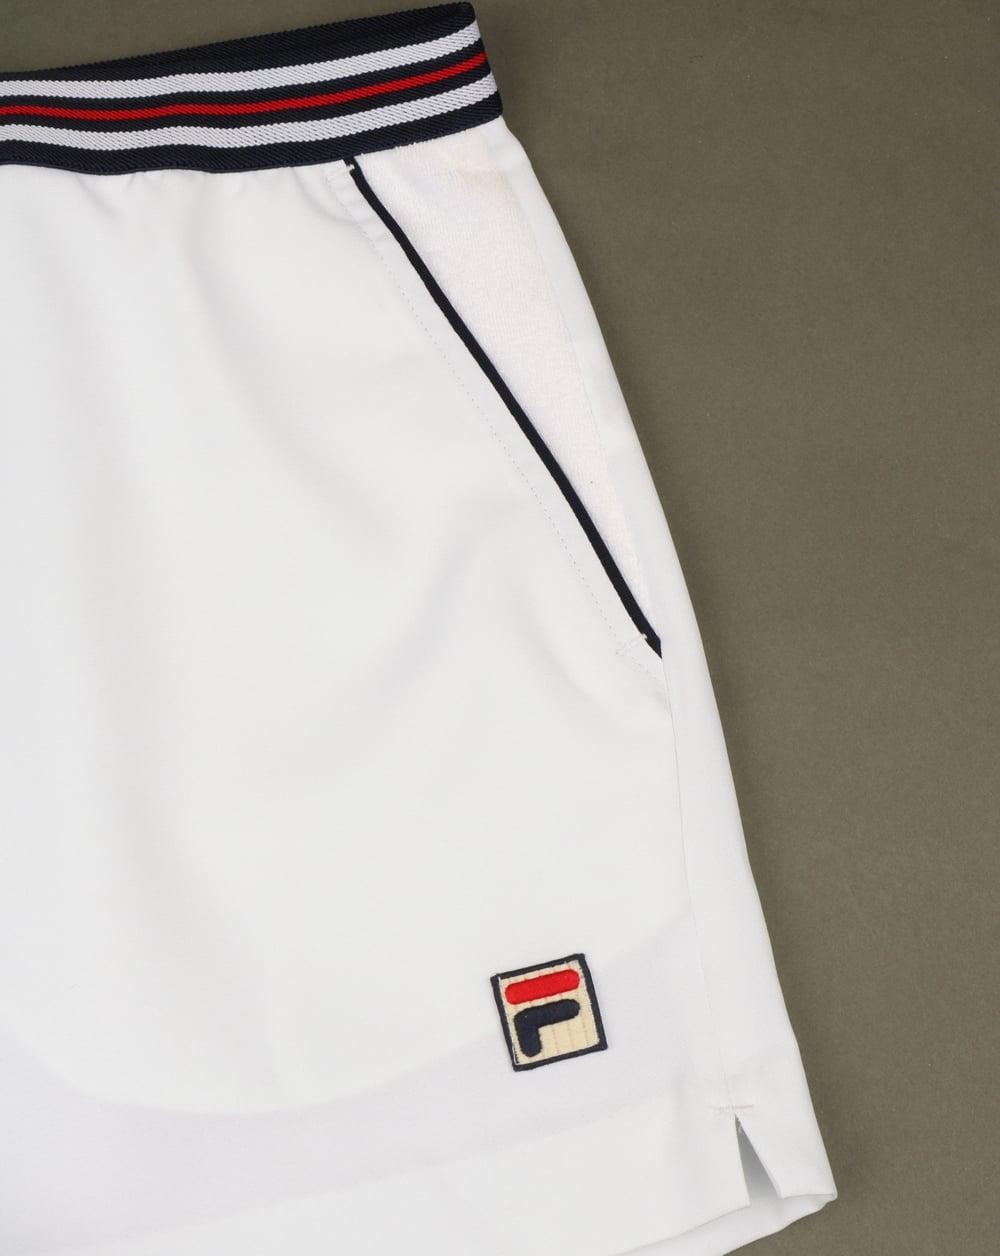 f36d5b04e0759 Fila Vintage High Tide 4 Shorts White,piping,retro,striped,mens